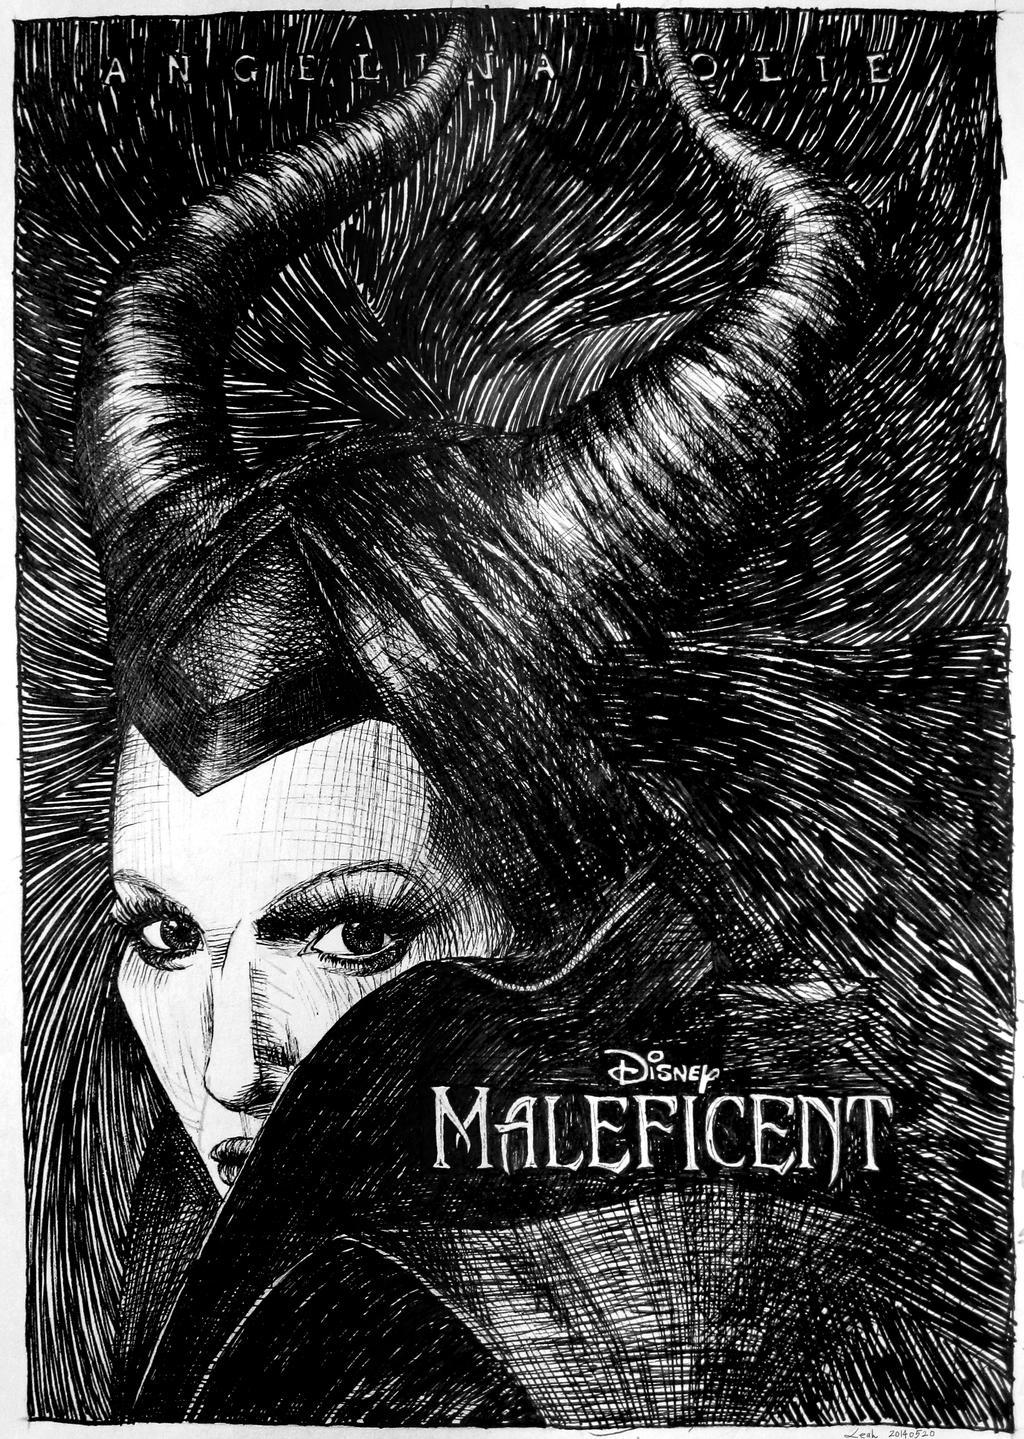 maleficent movie poster by pisces219320 on deviantart